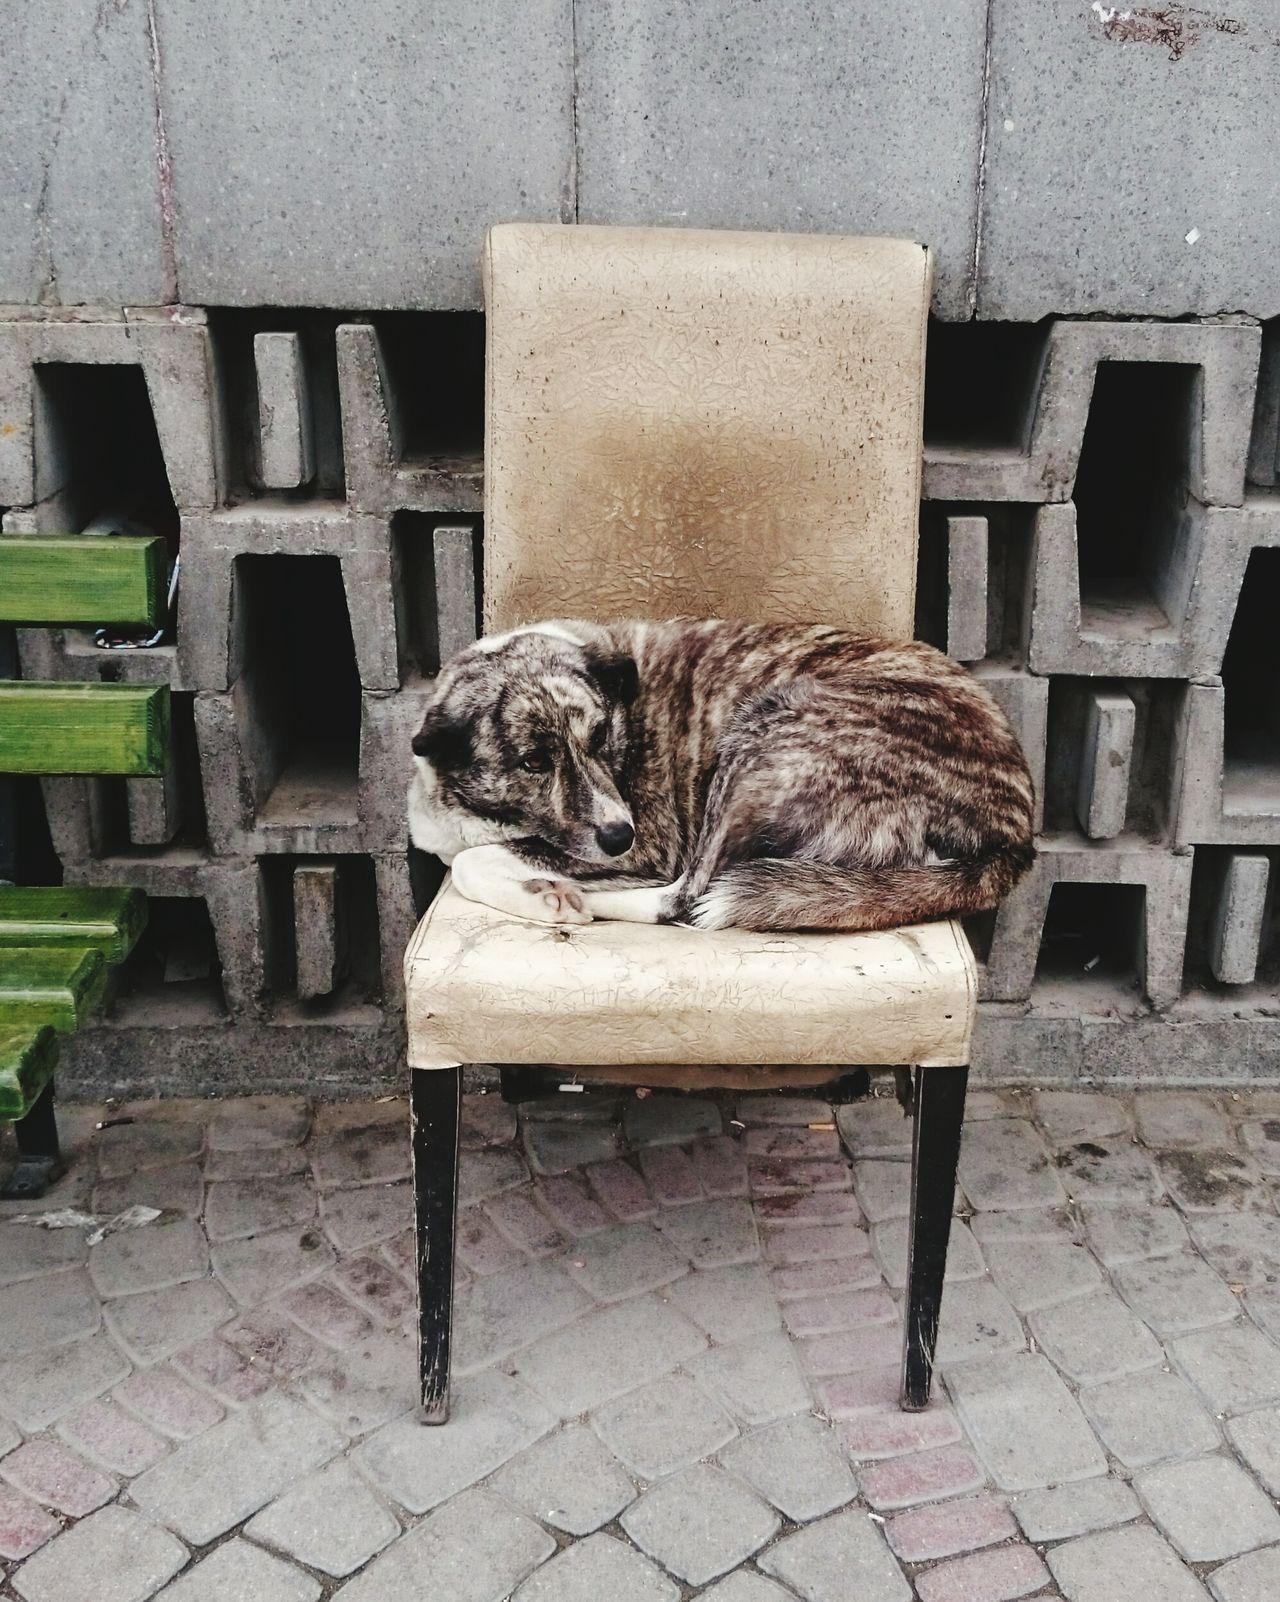 Dog Dogs Sleeping Sleeping Dog Chair Hund Hunde Liebe ♡ Dog Love Dog❤ Perro